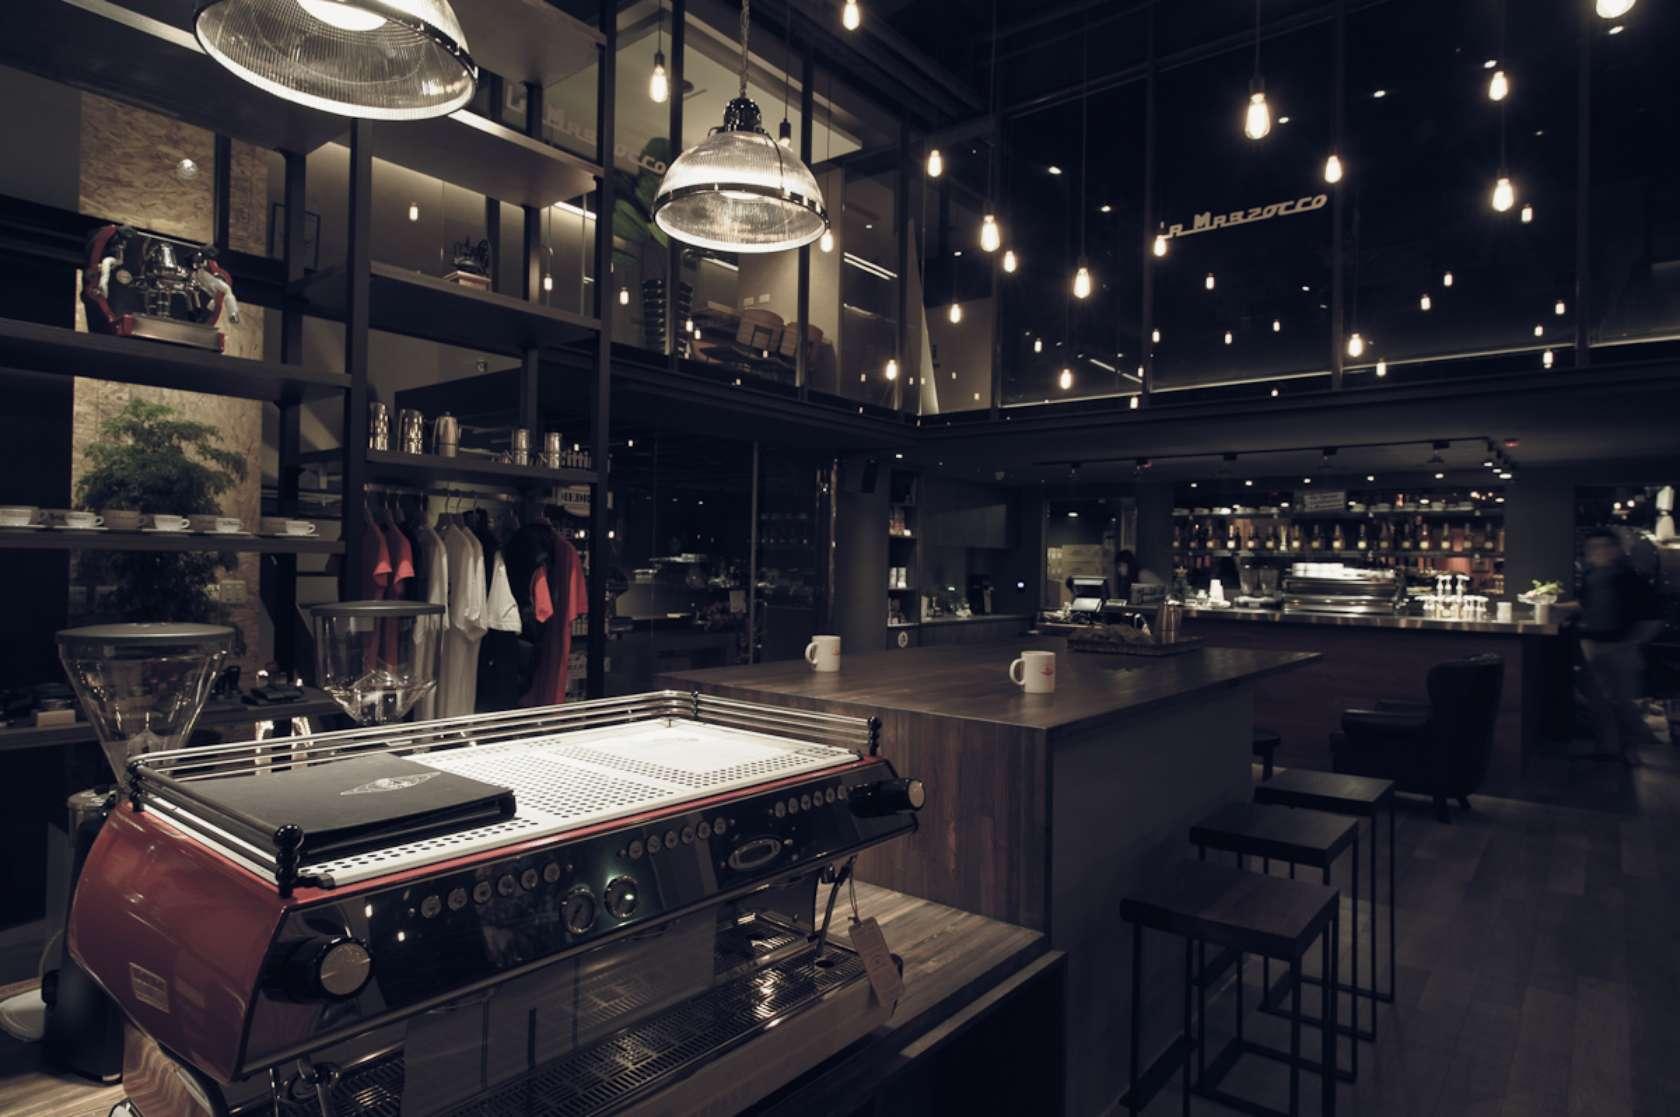 la marzocco flagship store taipei architizer. Black Bedroom Furniture Sets. Home Design Ideas